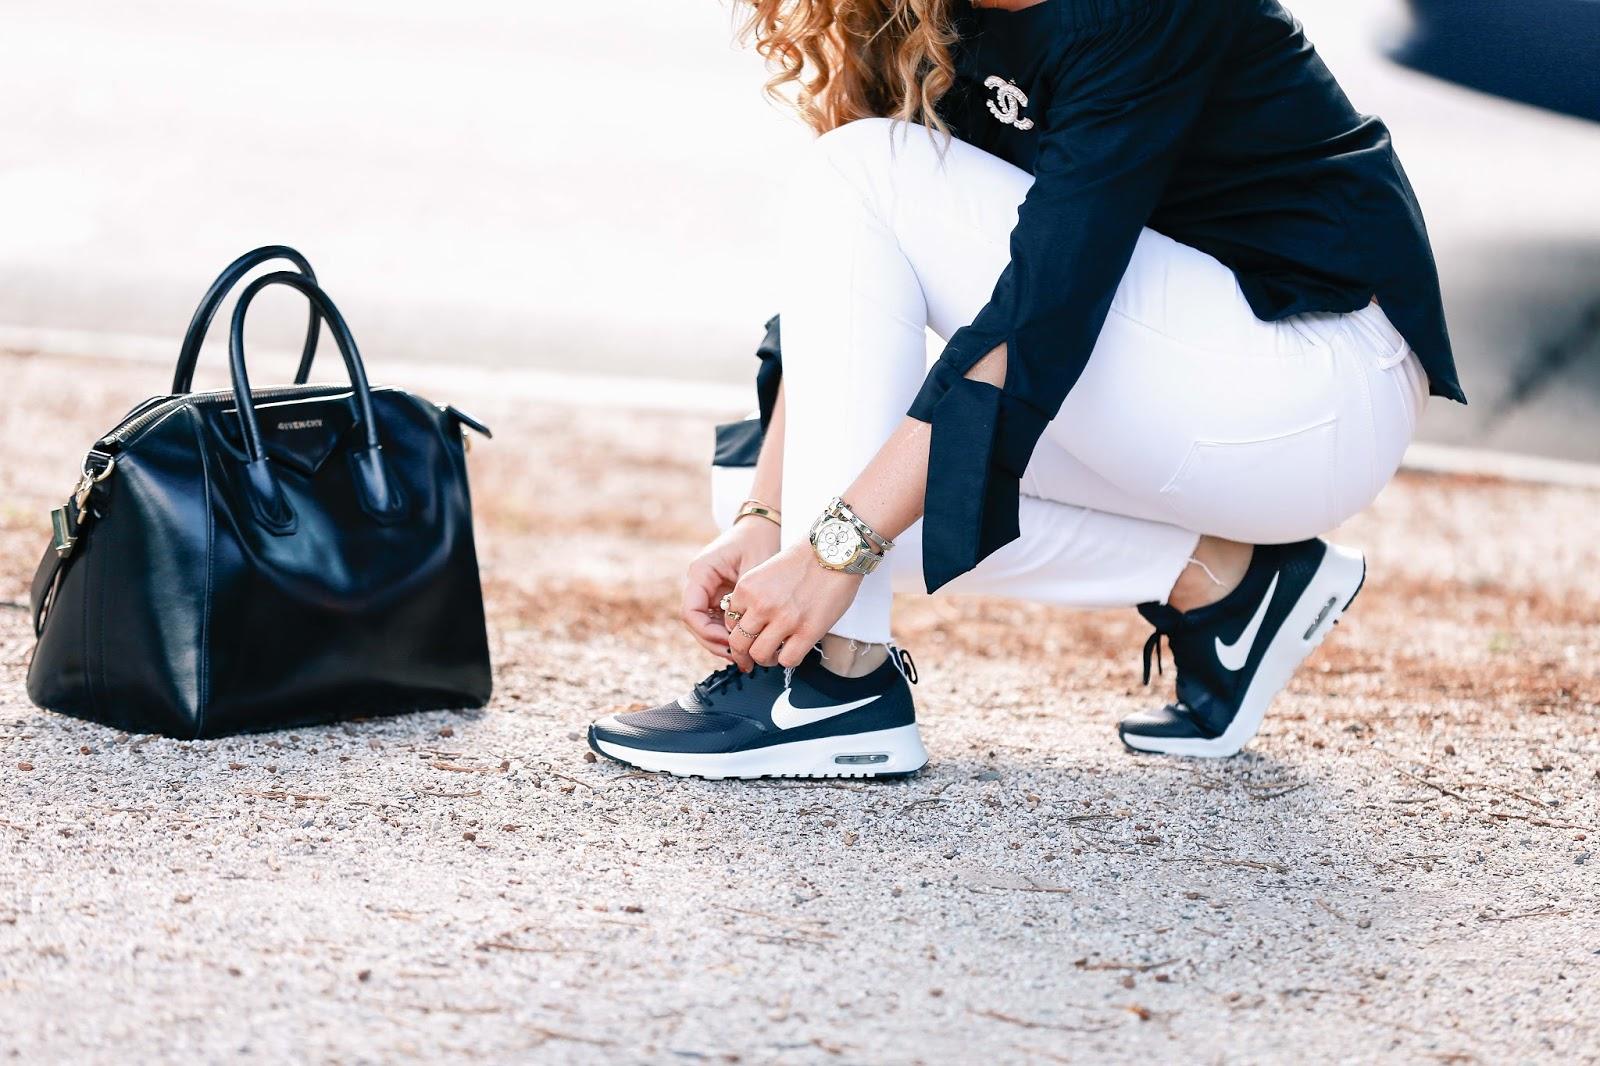 Givenchy-tasche-blogger-style-casual-look-nike-sneaker-schwarze-sneaker